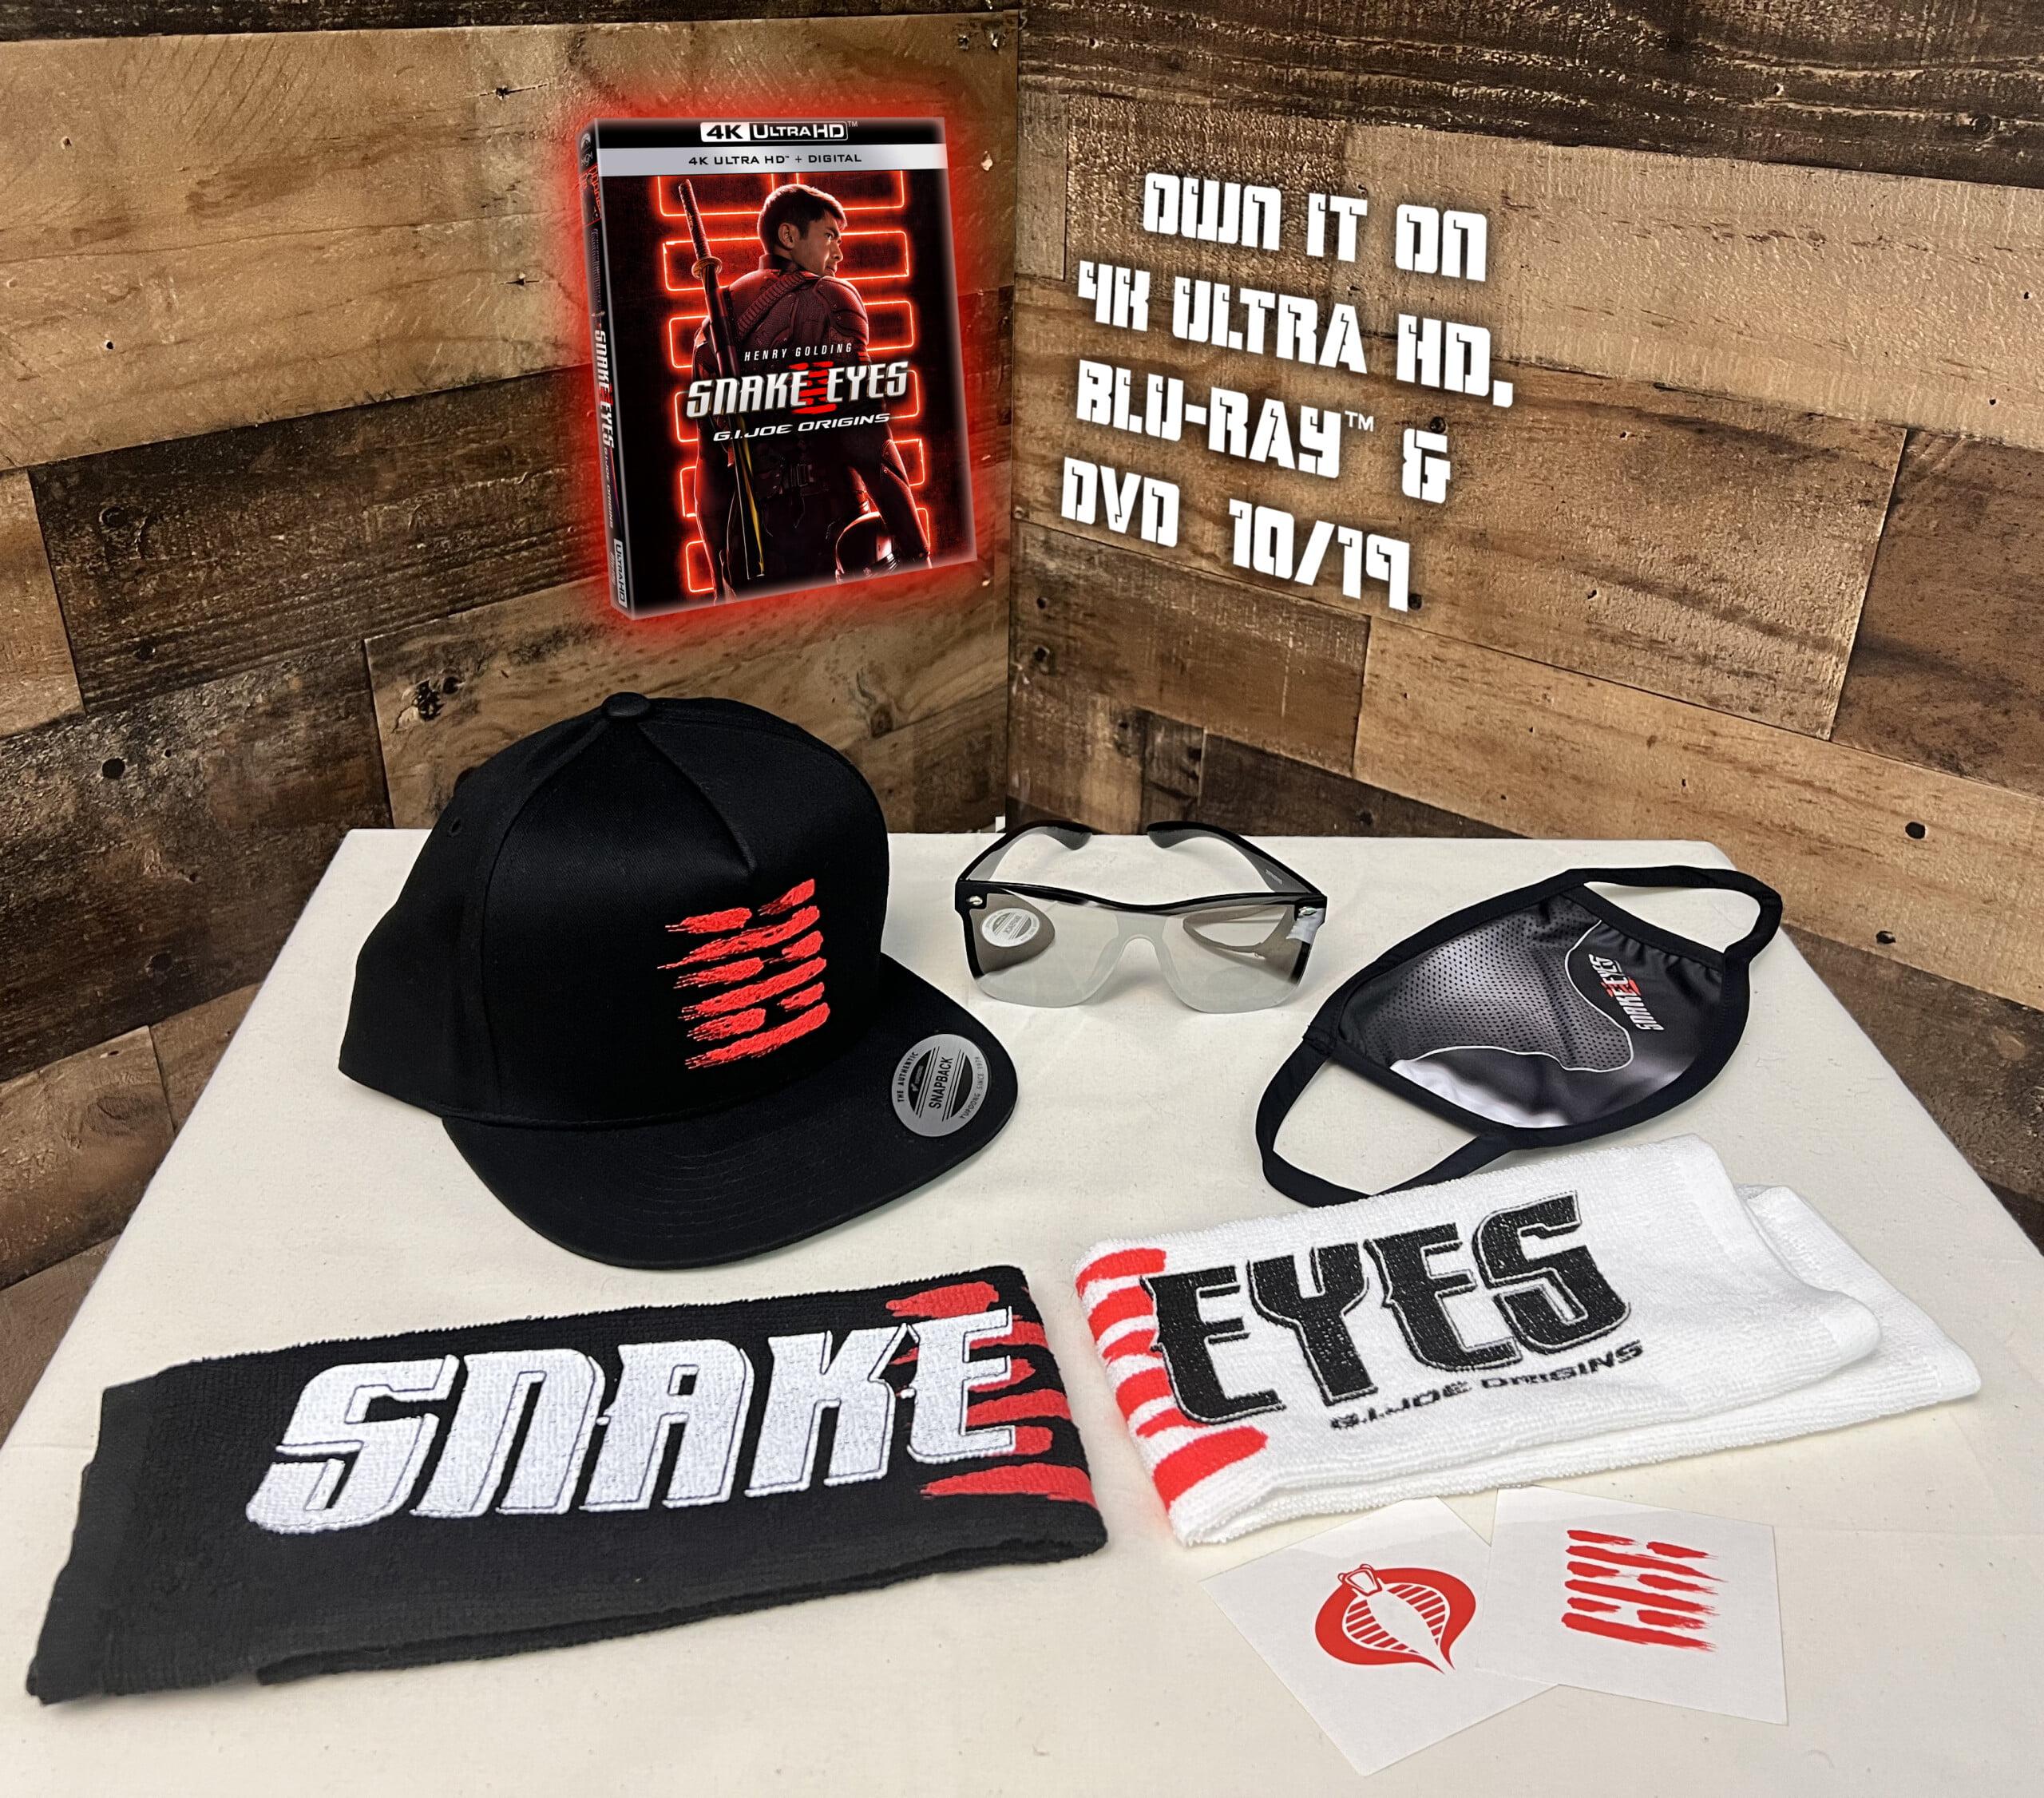 Snake Eyes: G.I. Joe Origins 4k Blu-ray prize pack